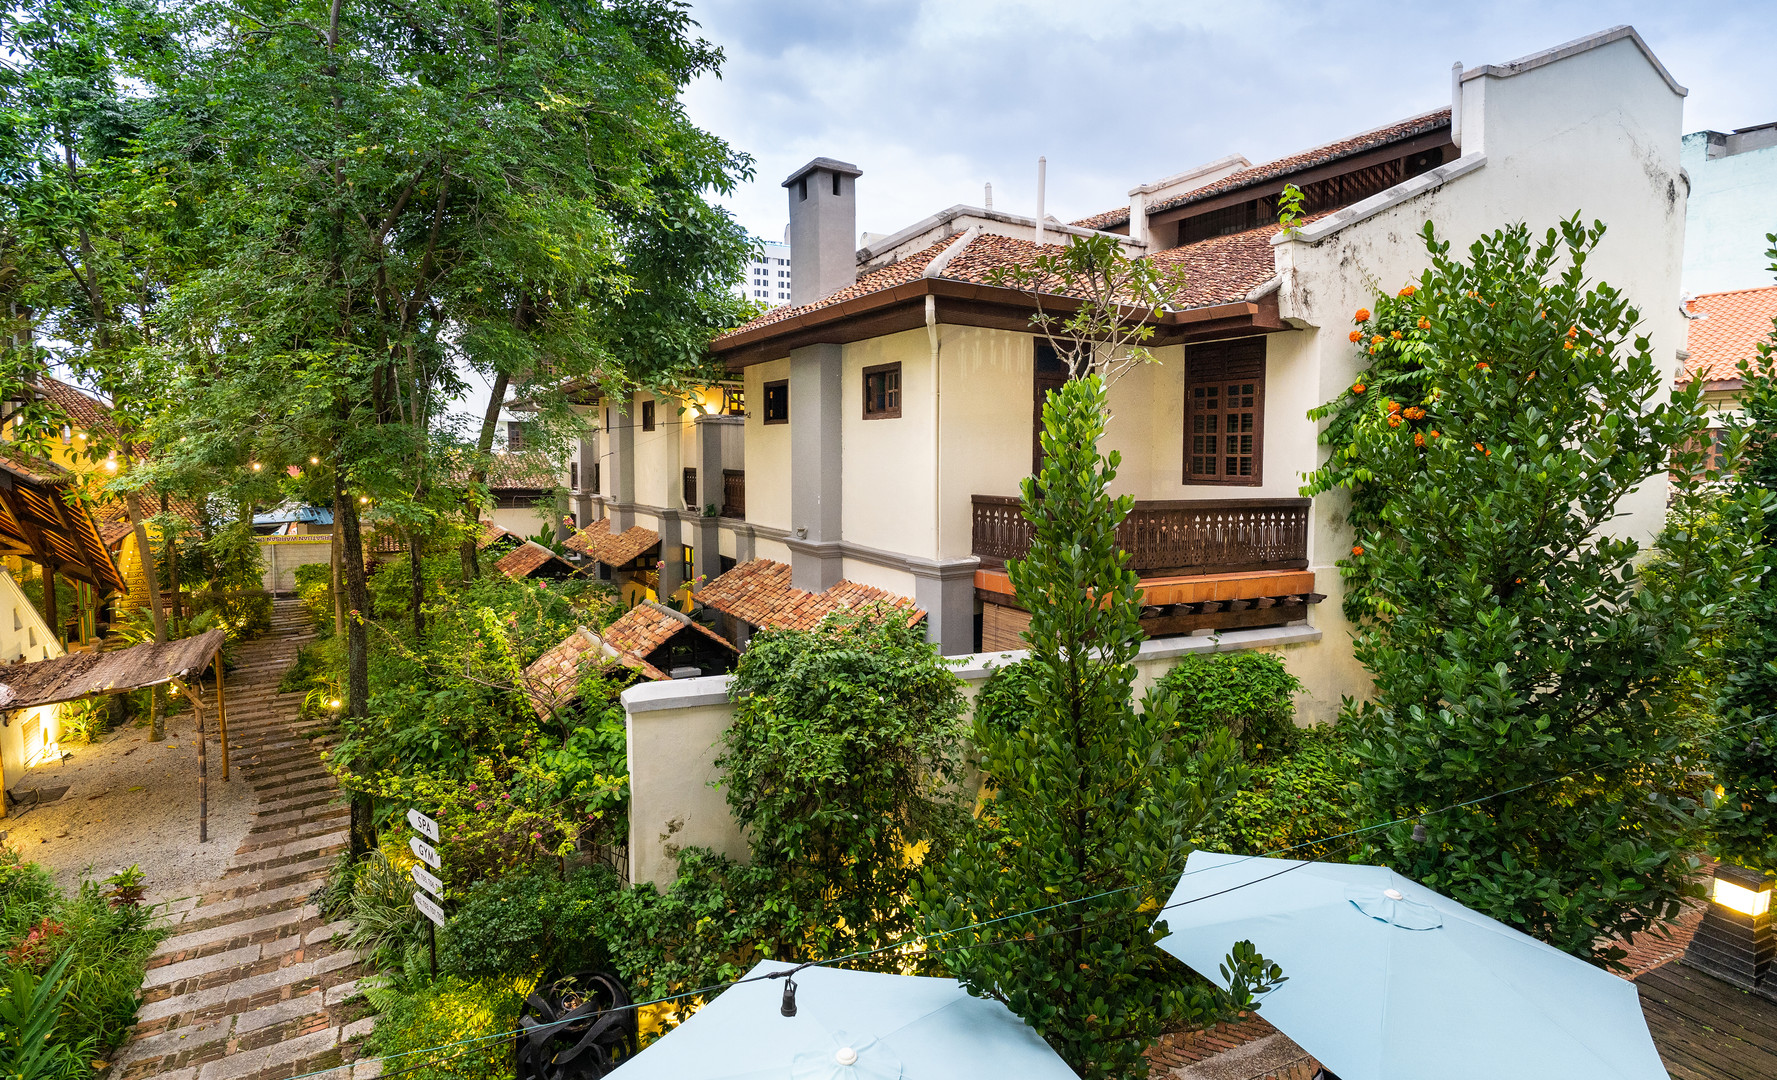 Hotel Penaga - Garden Area (1)